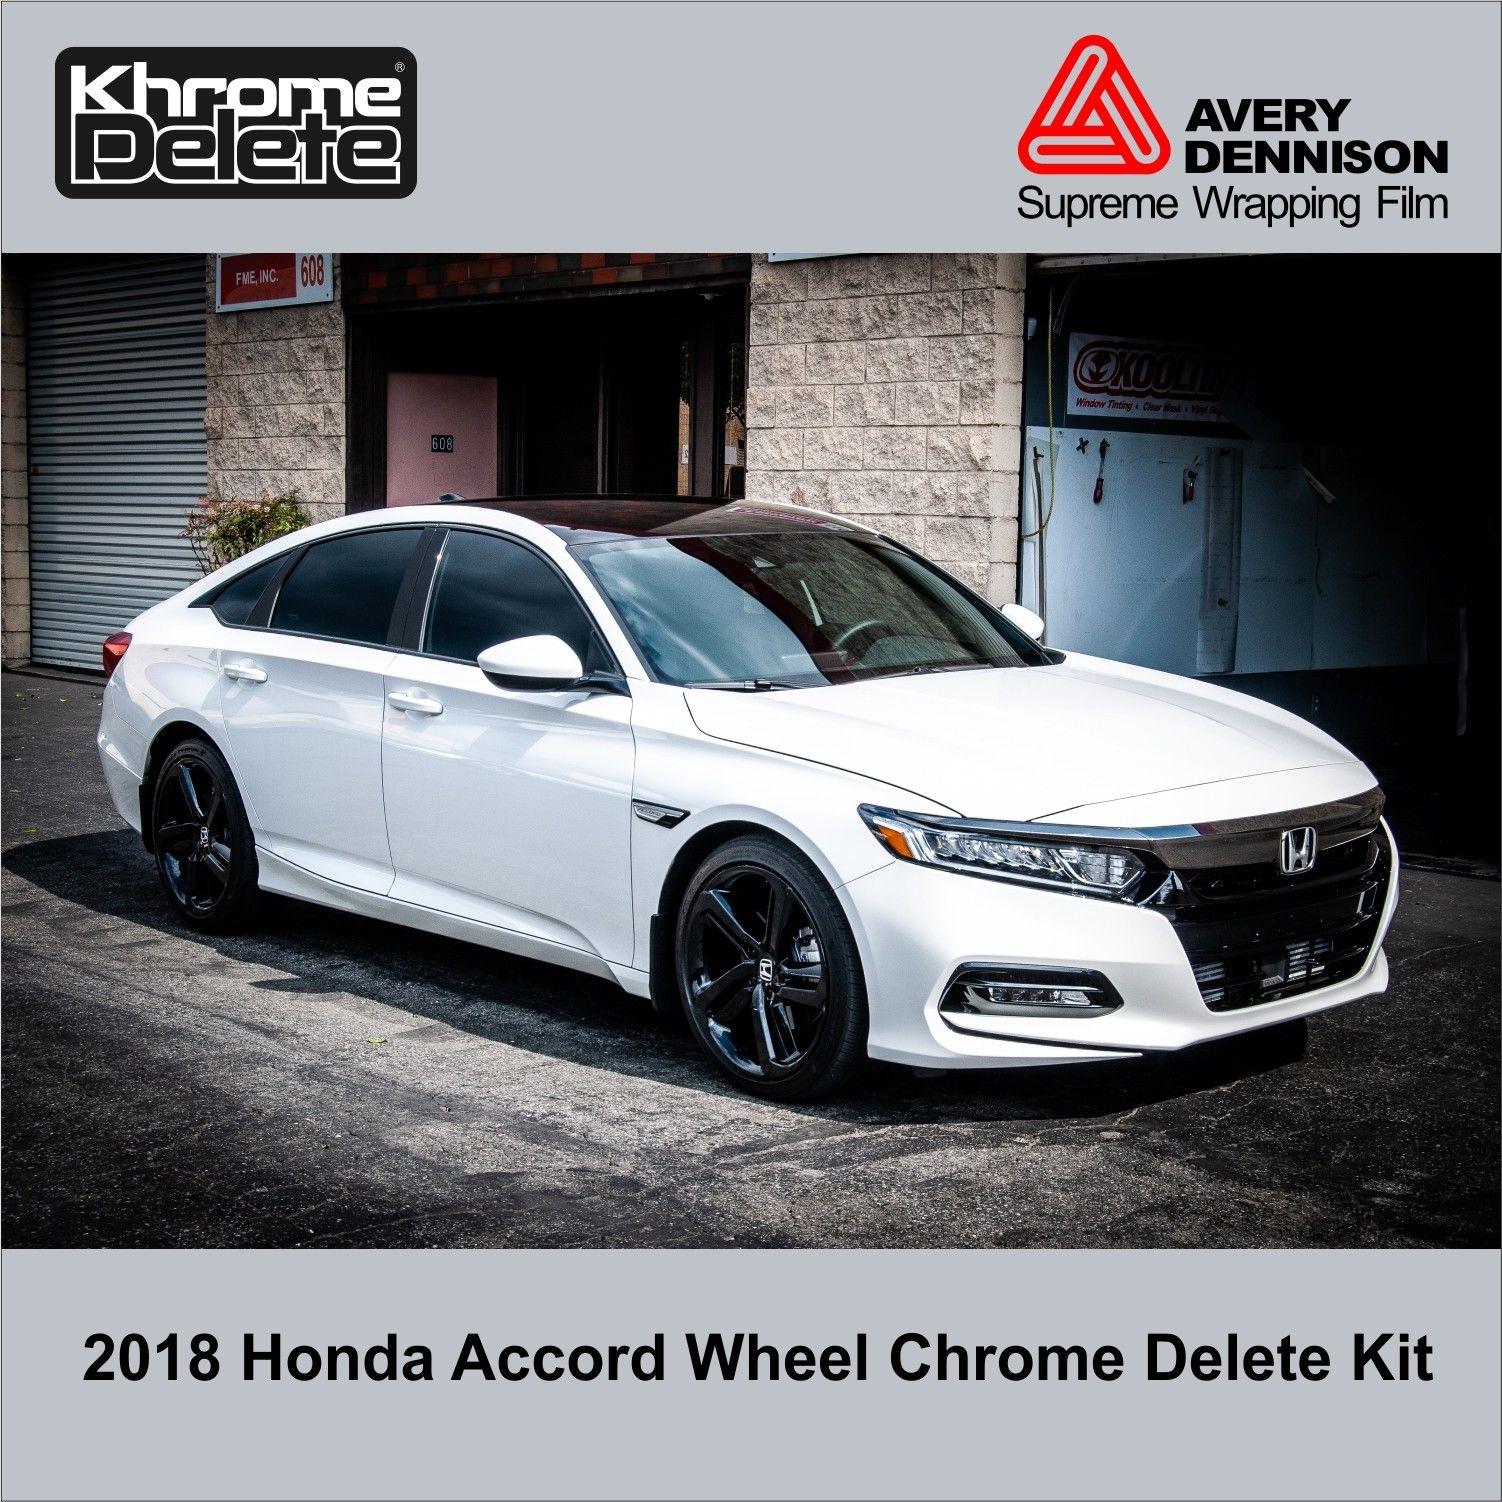 Awesome 2018 Honda Accord Sedan Sport Wheel Chrome Delete